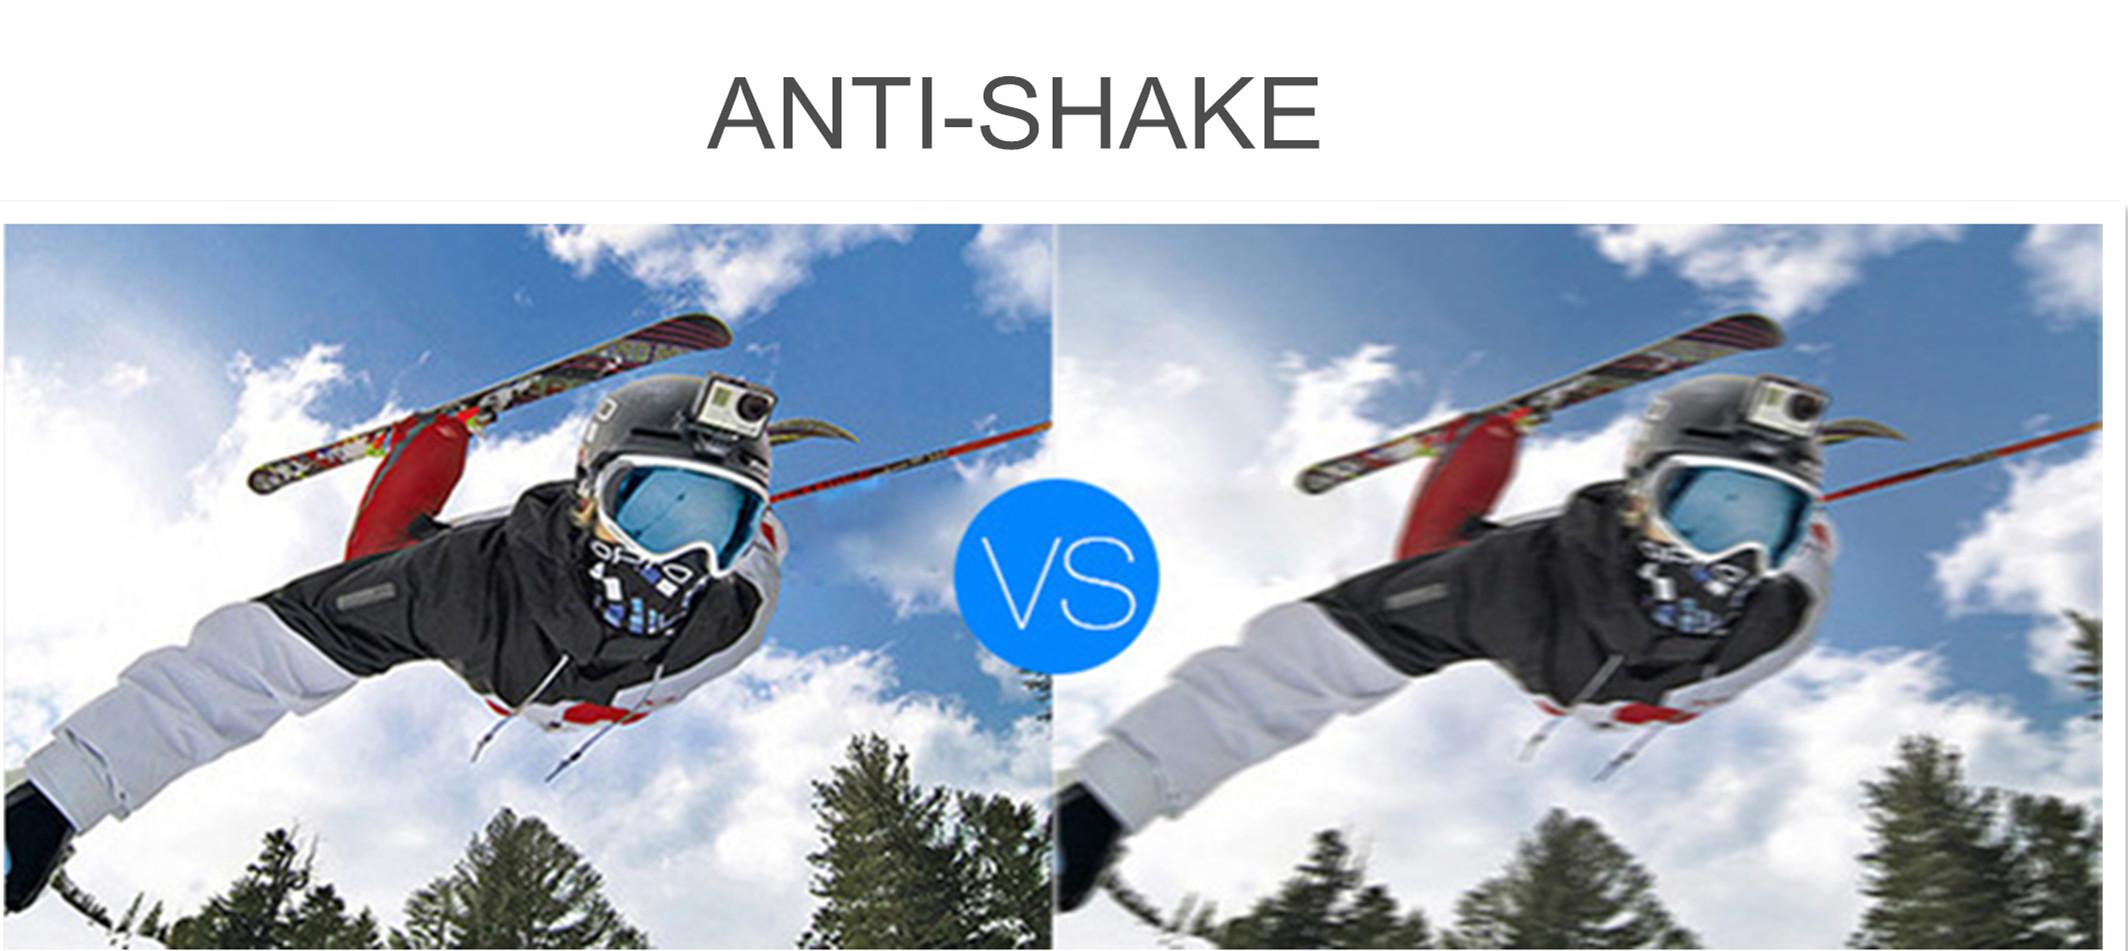 2anti-shake.jpg